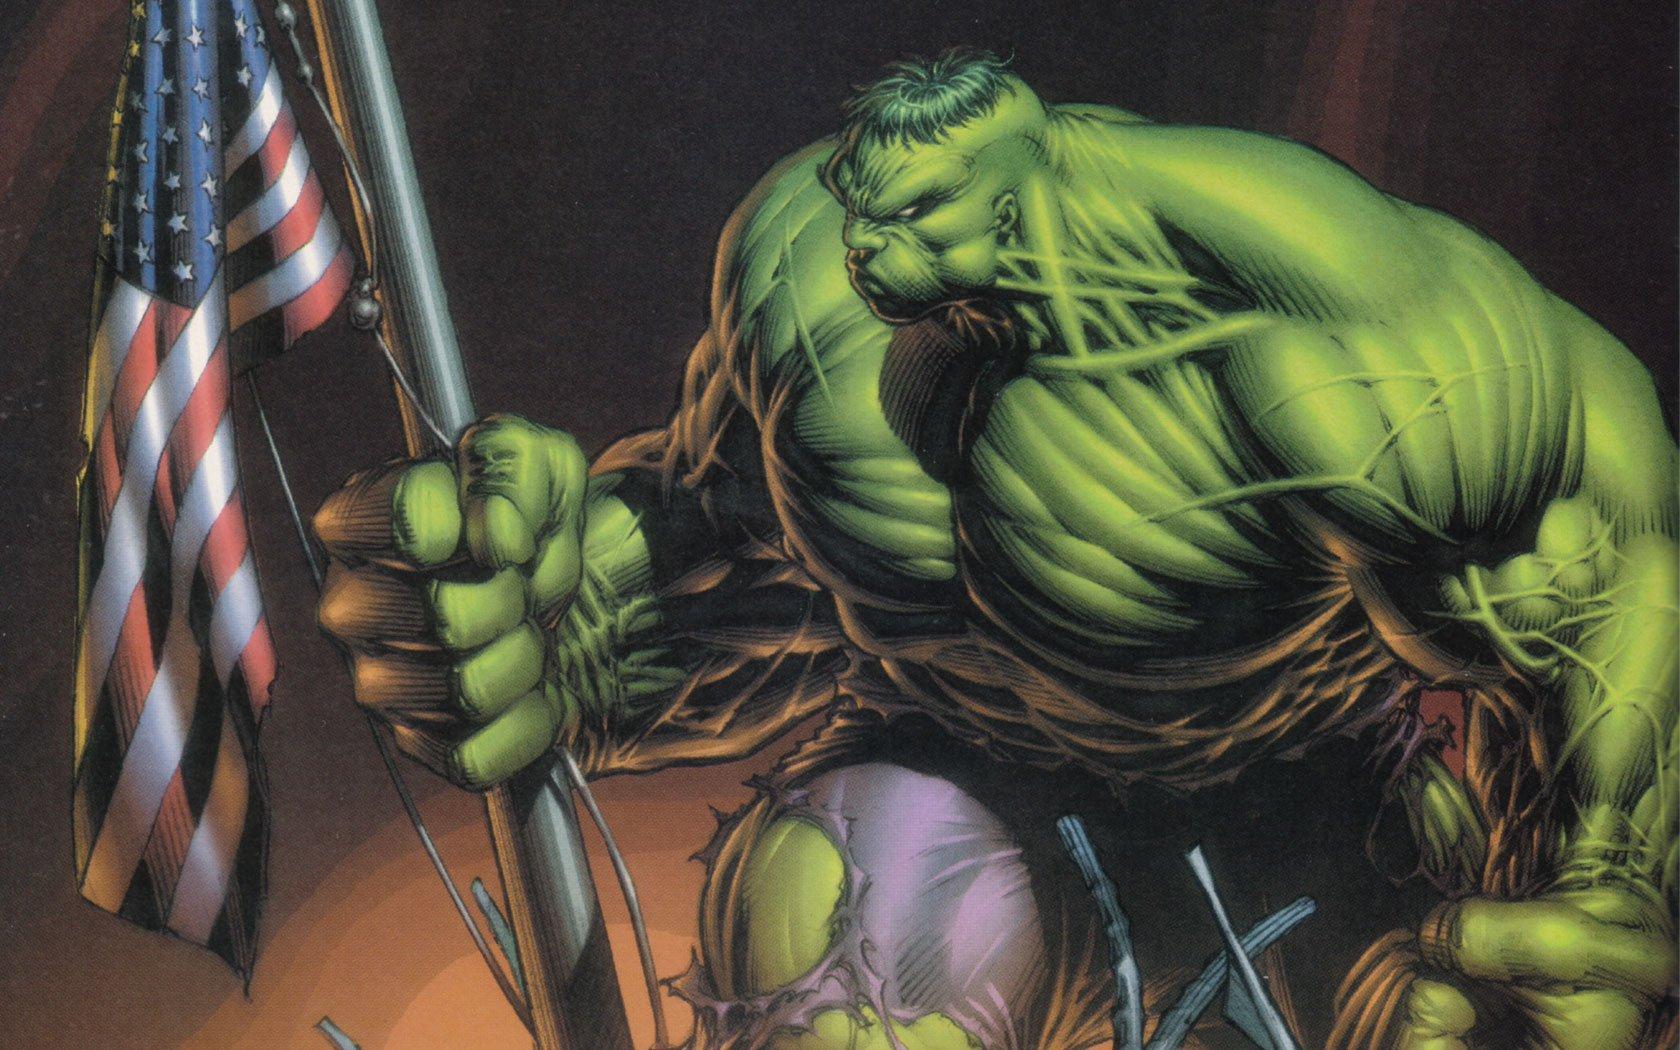 Hulk comic character Marvel Comics wallpaper 1680x1050 1680x1050